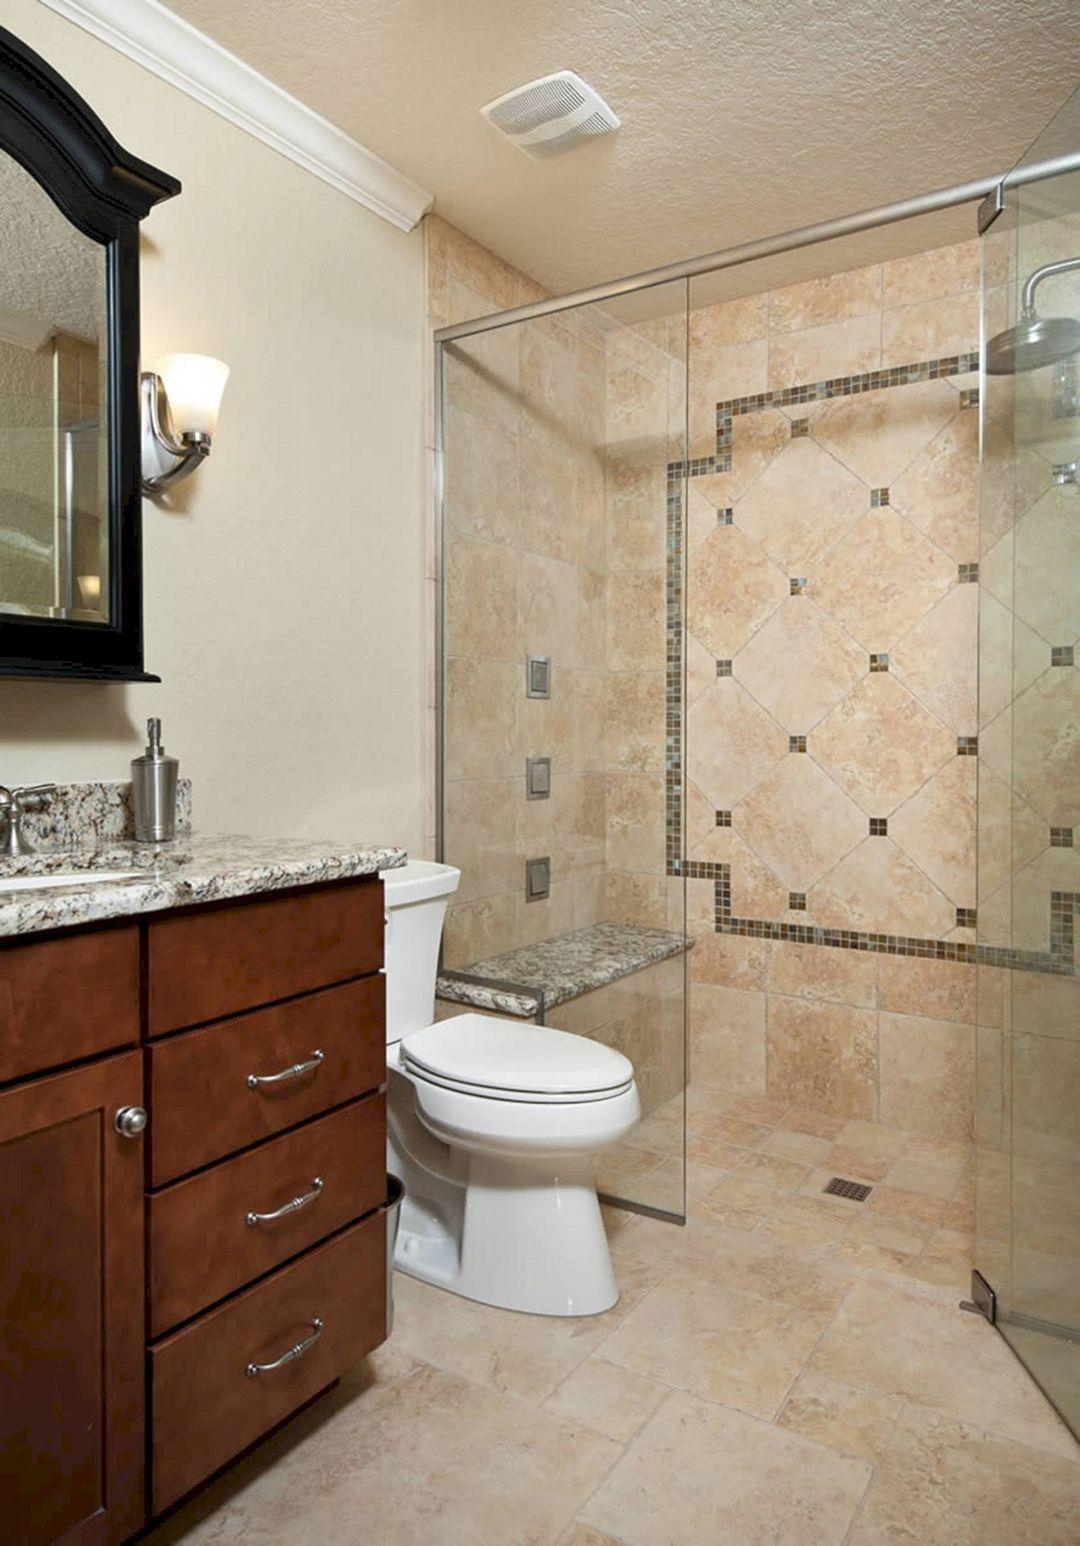 pin by ruben magdaleno on building small condo bathroom on bathroom renovation ideas id=72692